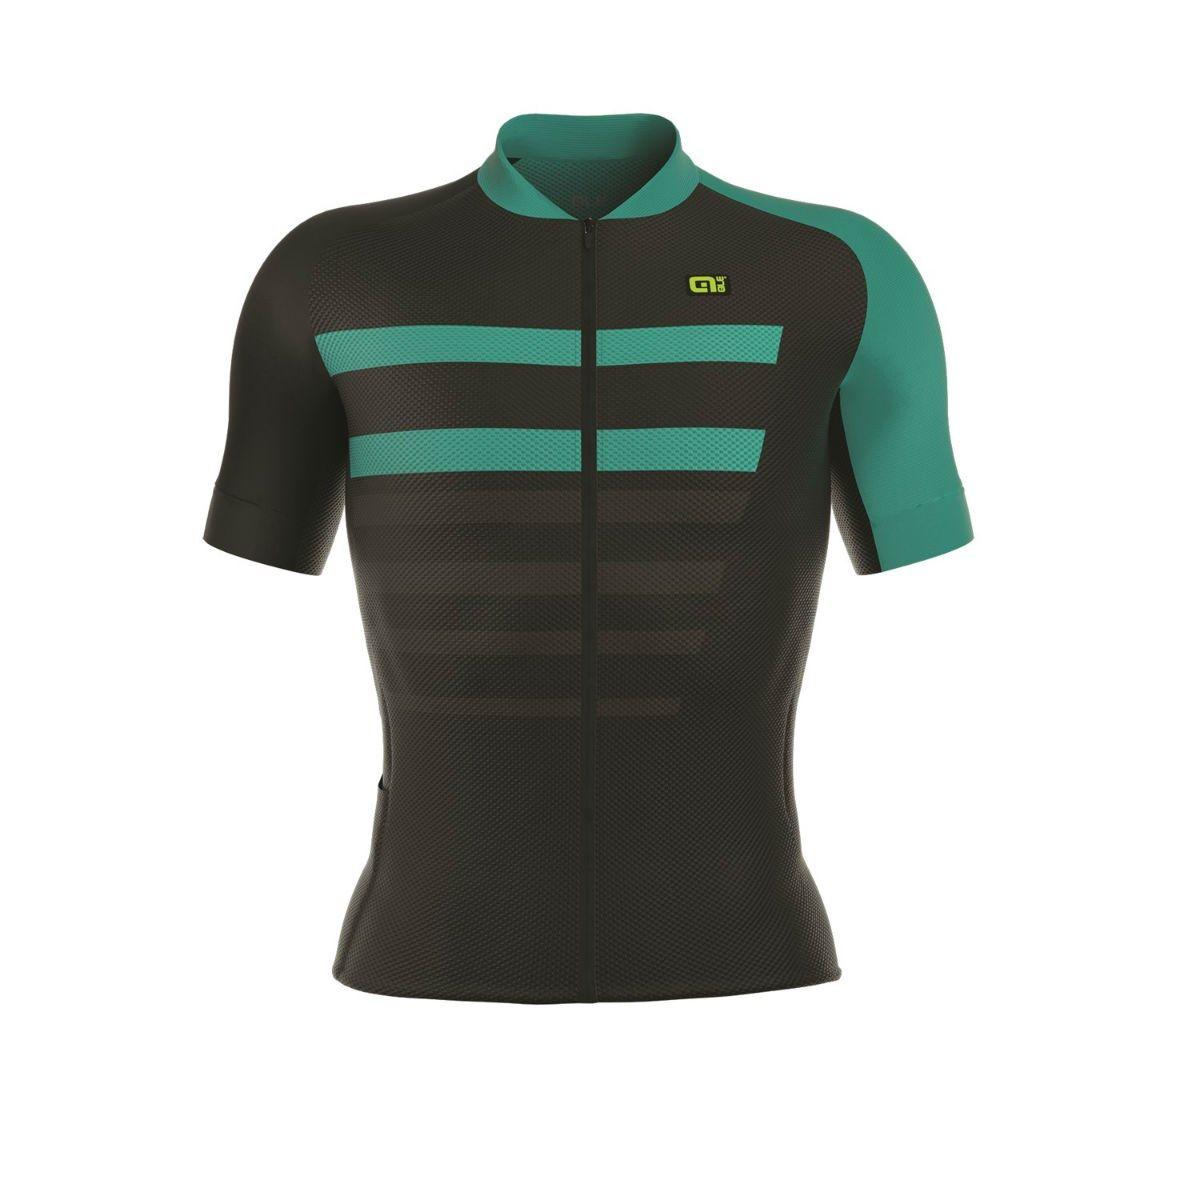 Ale SS17 PRR 2.0 Piuma Short Sleeve Jersey Black Turquoise  0a924eda4